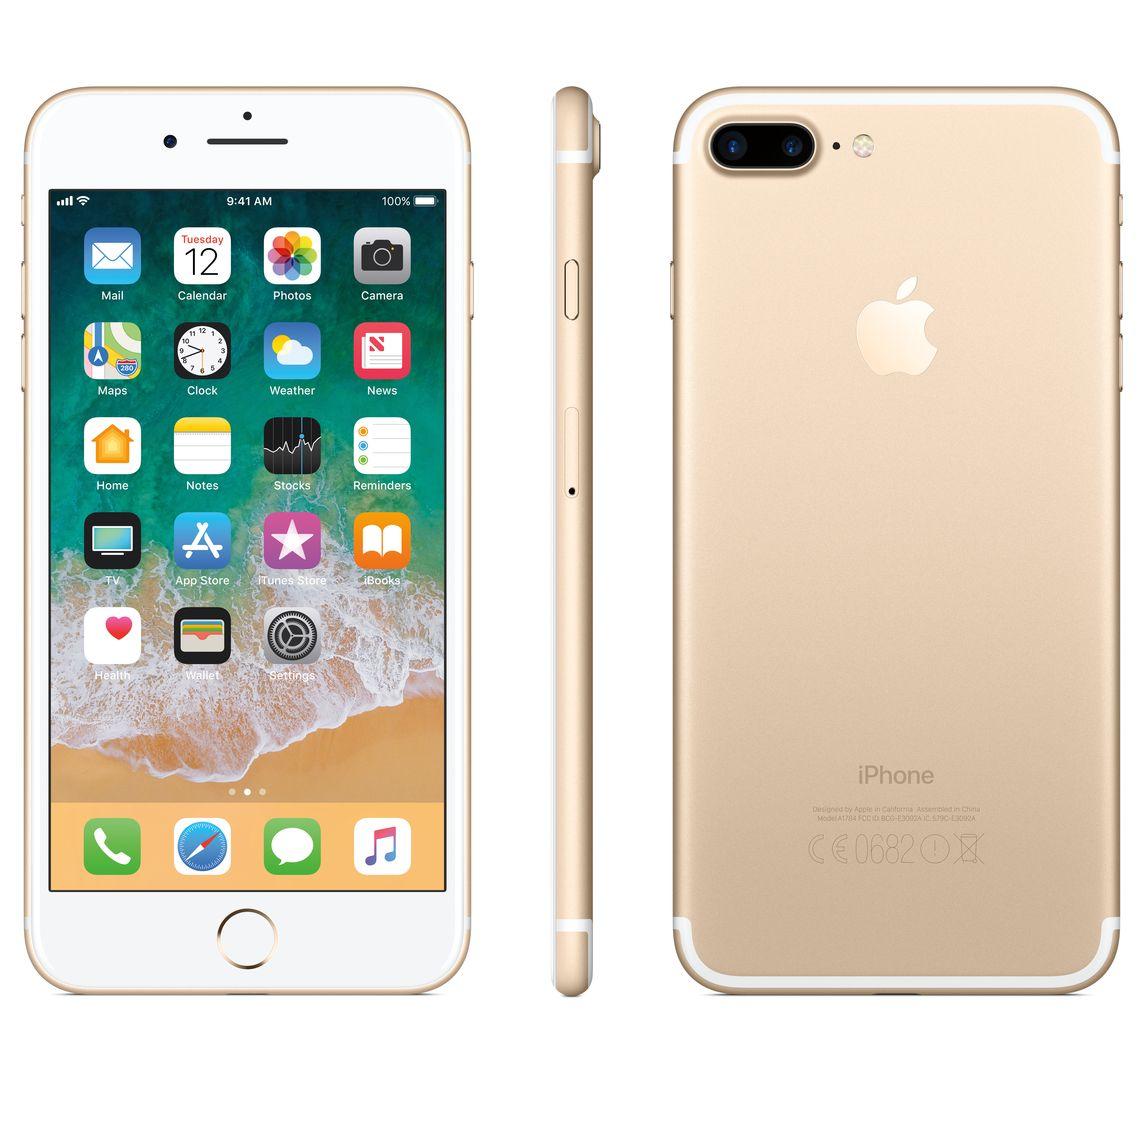 Refurbished iPhone 7 Plus 128GB - Gold (Unlocked)